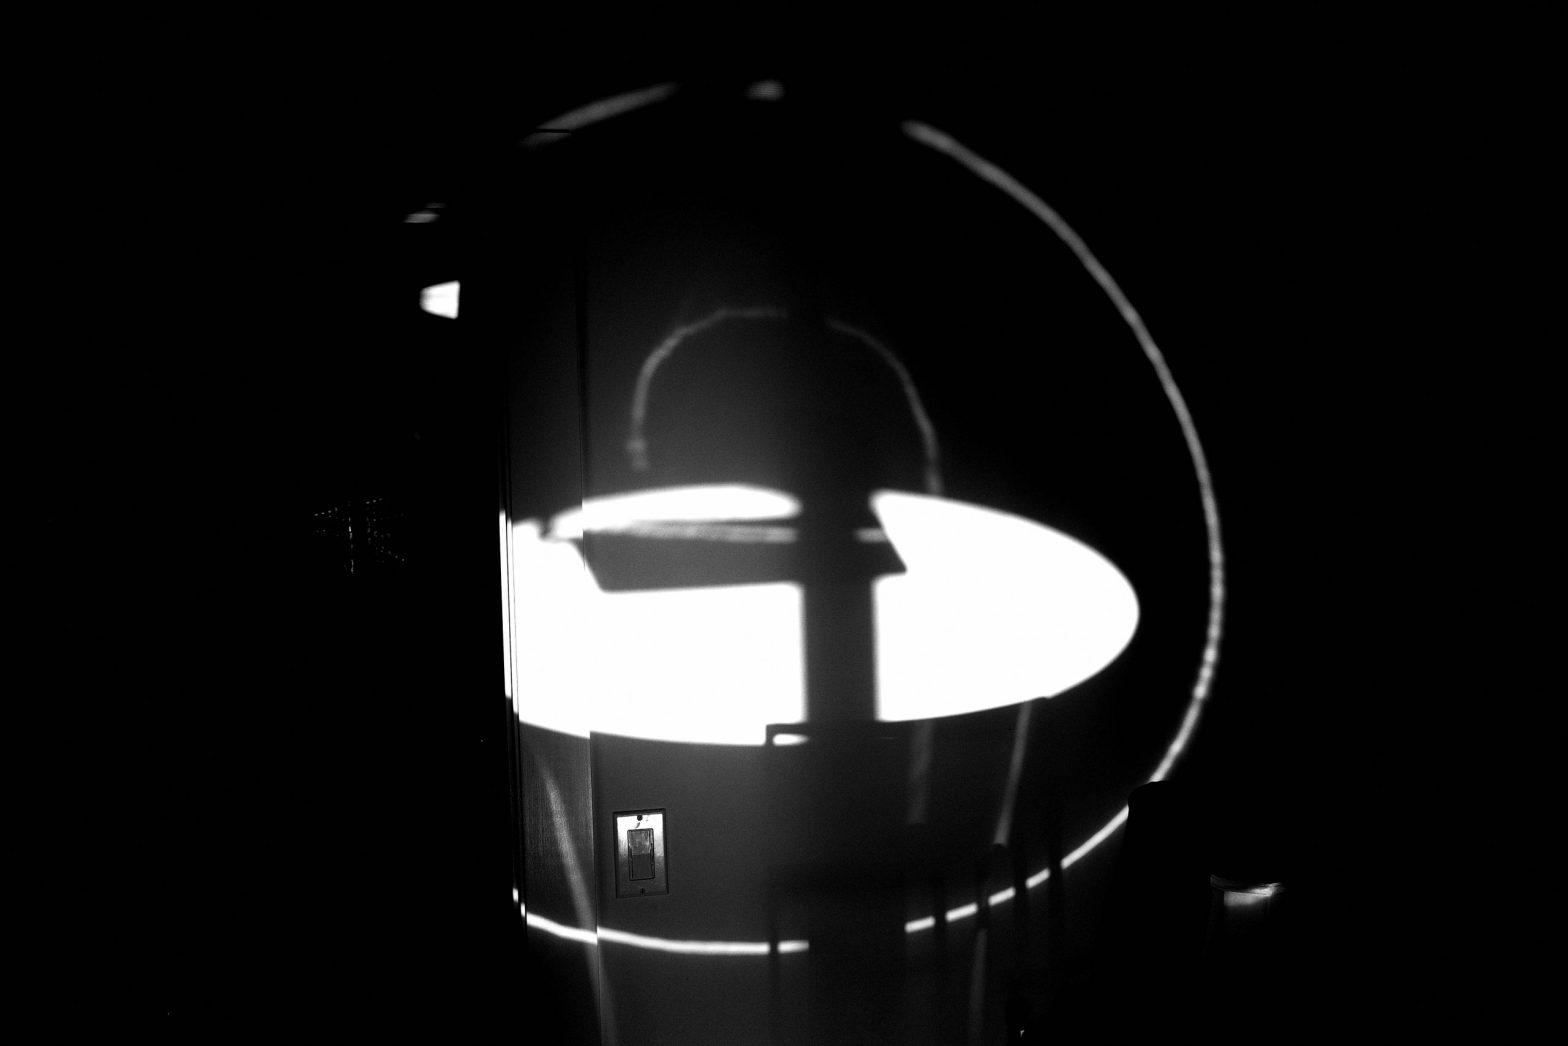 EK065701 abstract black and white ricoh